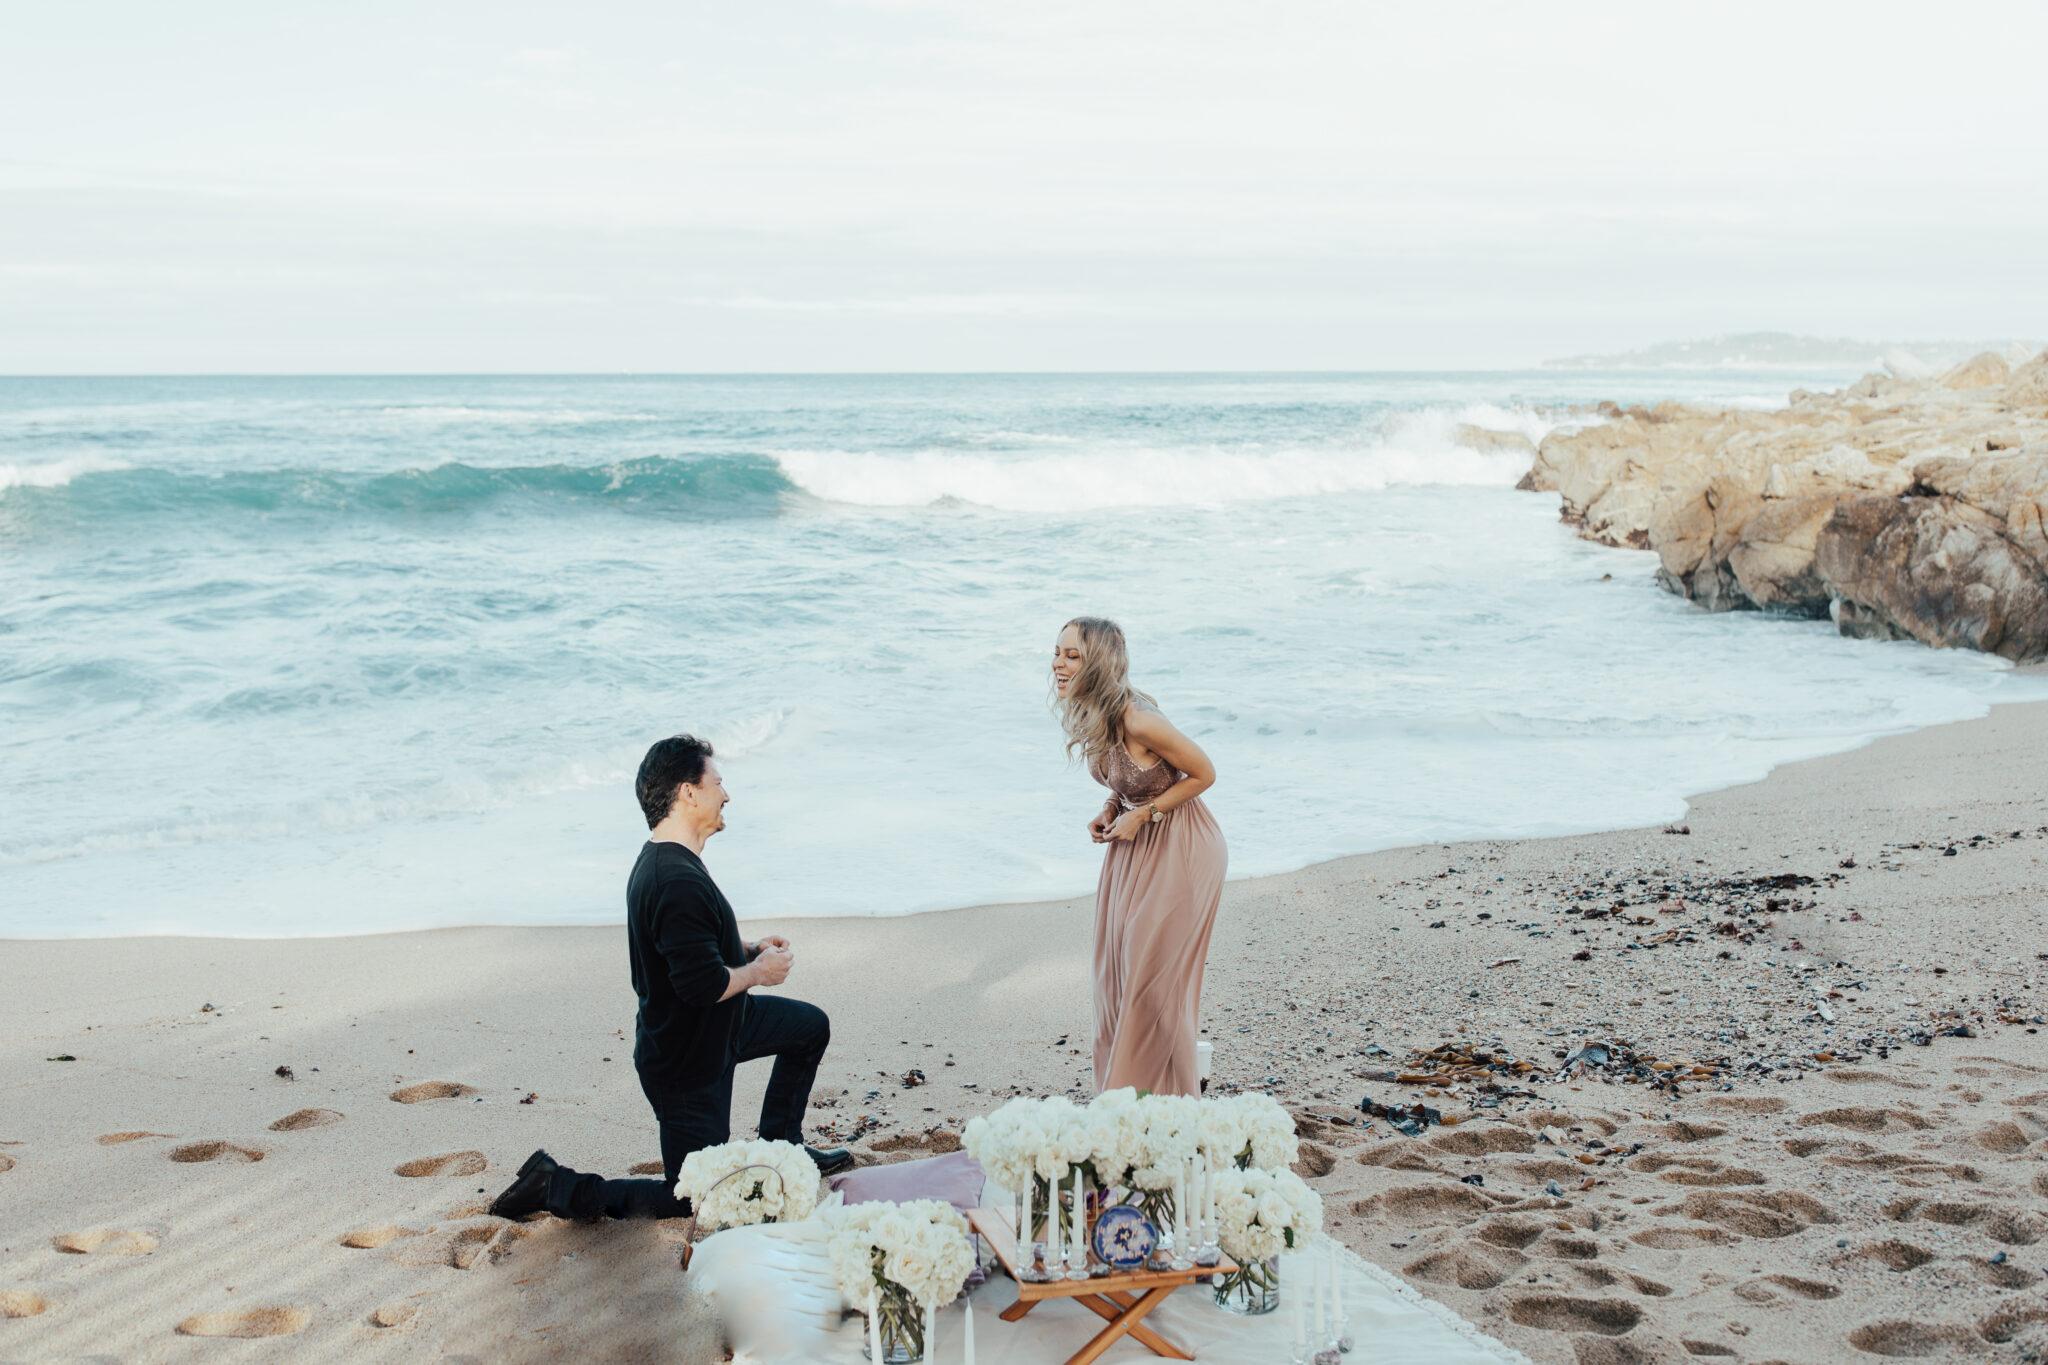 man proposing in sand